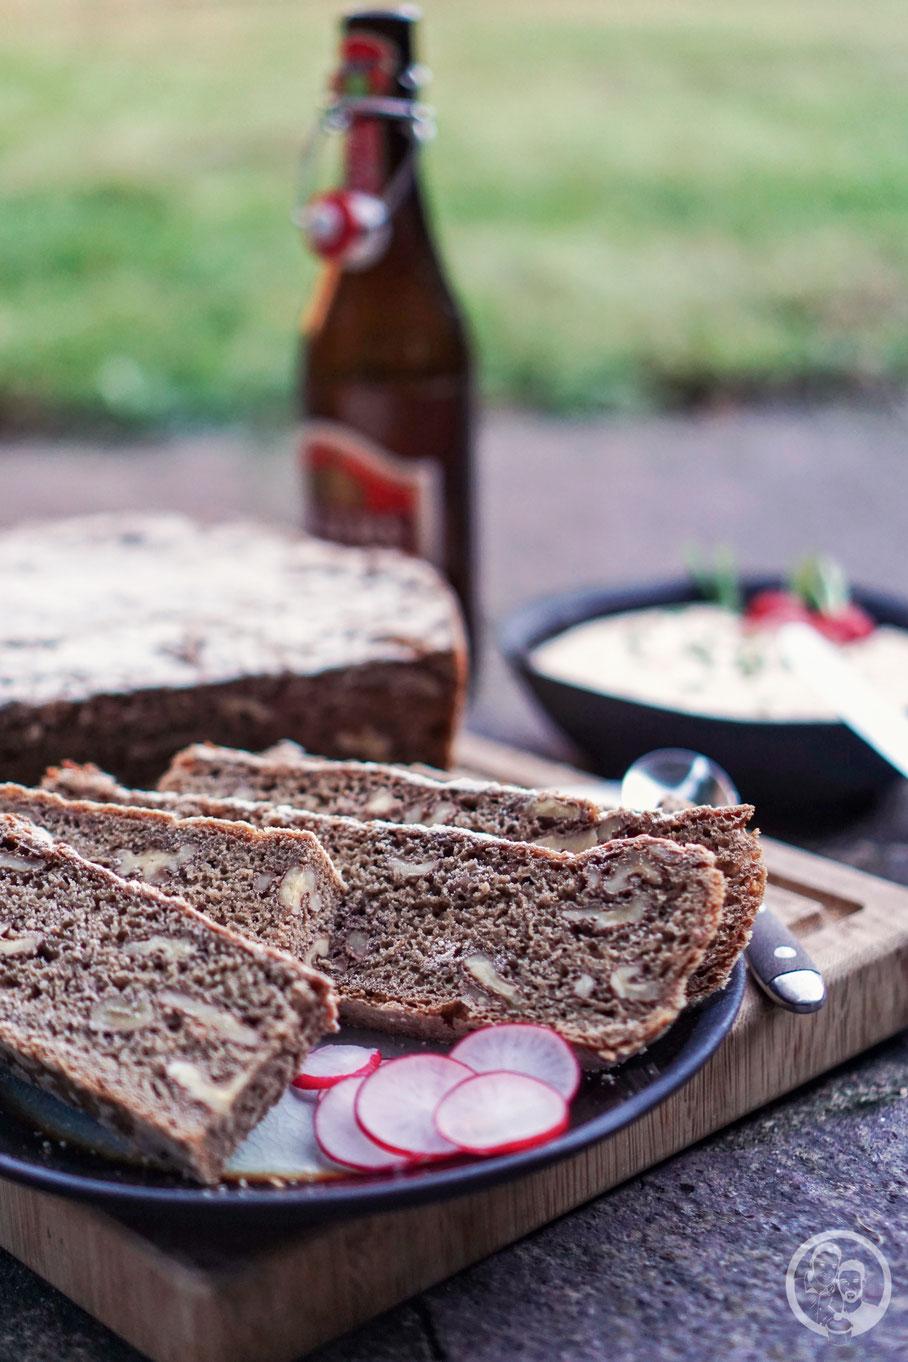 French Toast_Armer Ritter_Frühstück_Ahornsirup_rezept_blog_foodblog_köln_Bacon_Eattheball